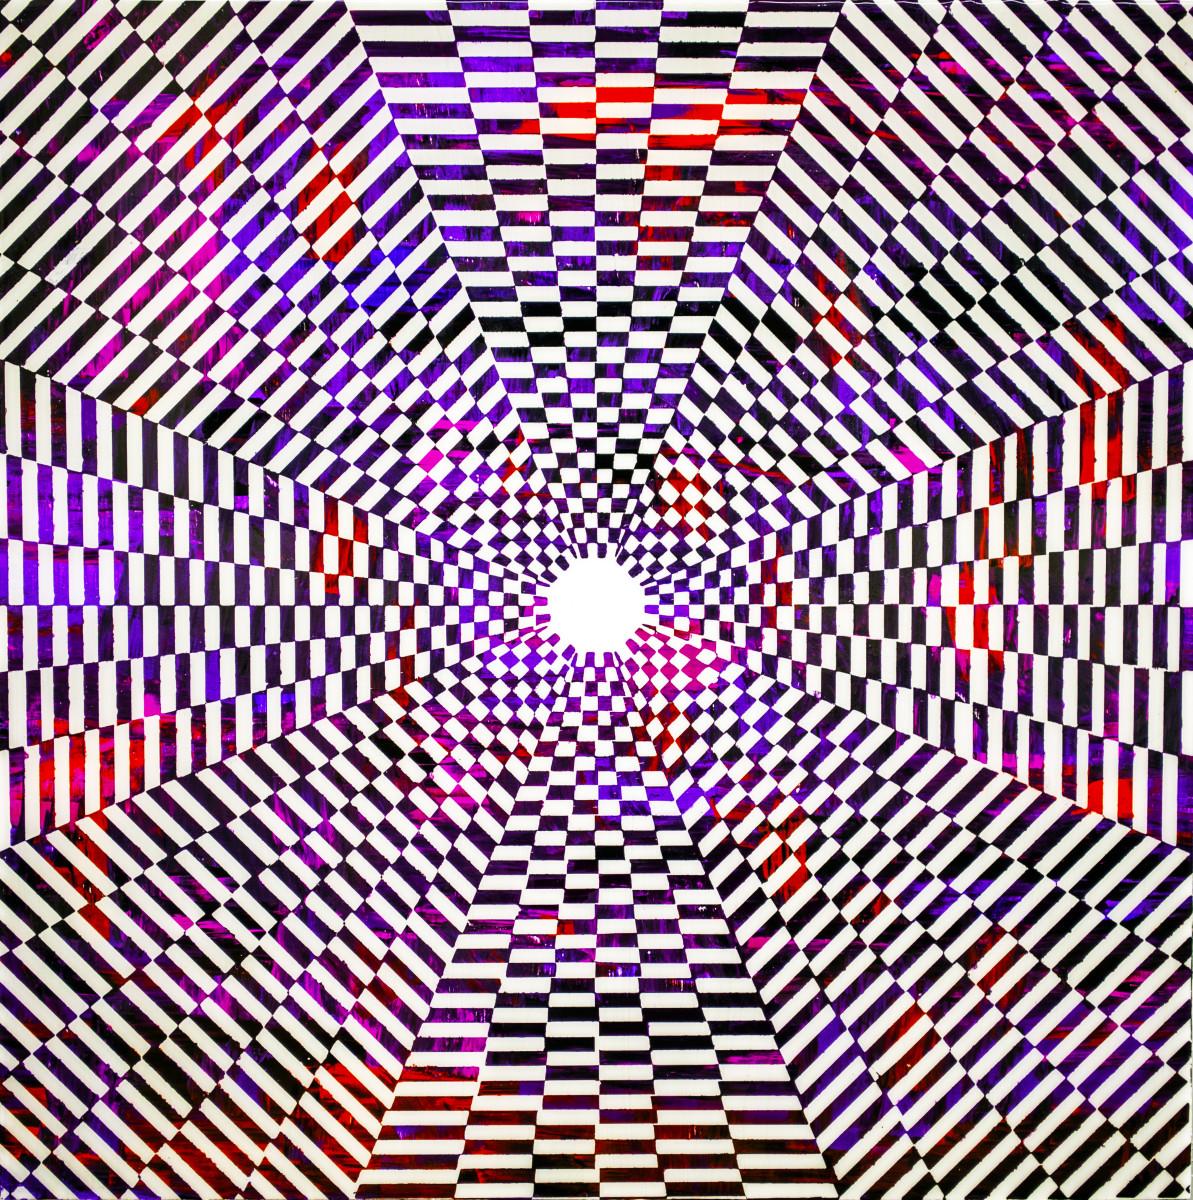 Lightspeed by Sean Christopher Ward